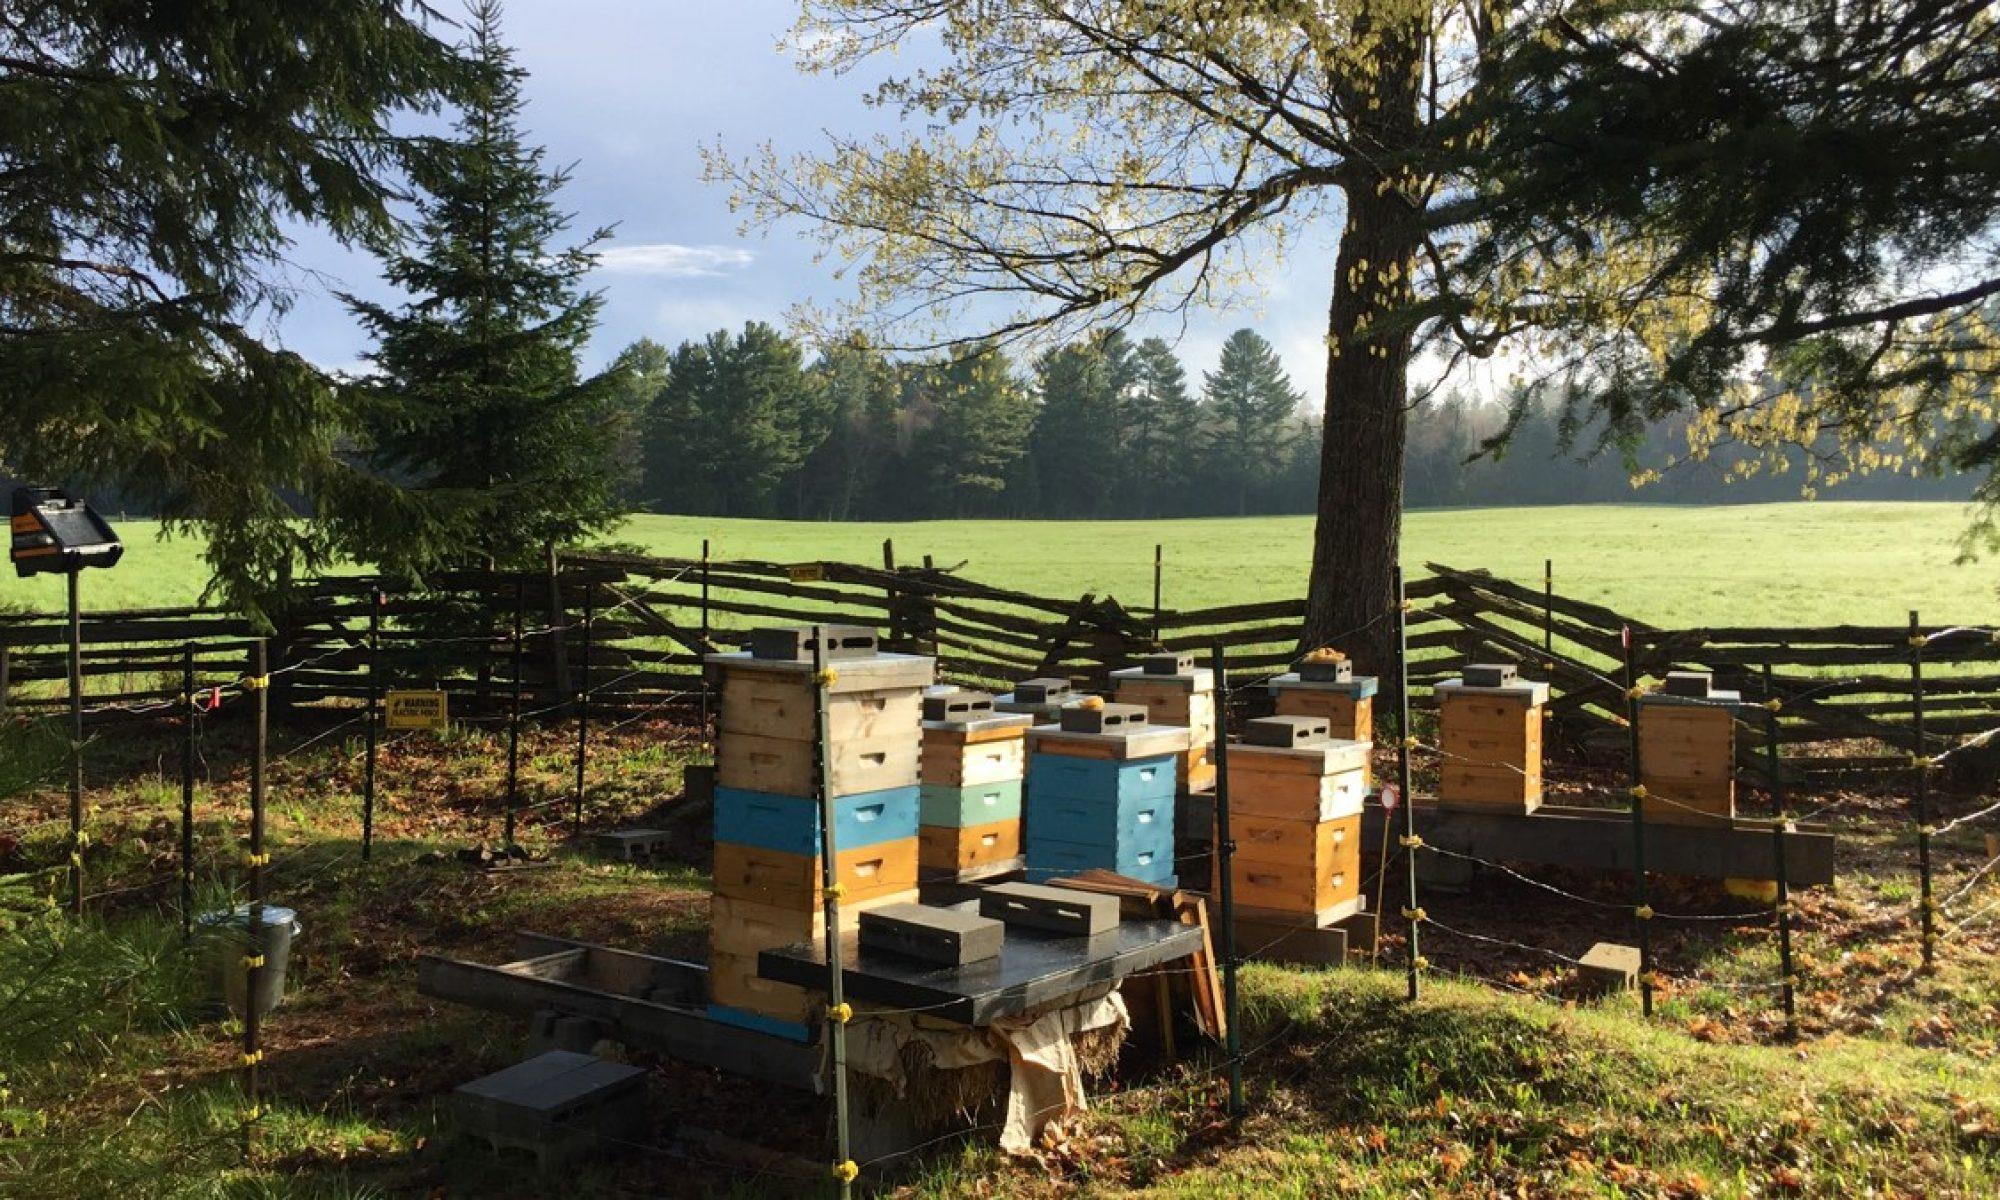 Muskoka Parry Sound Beekeepers Association